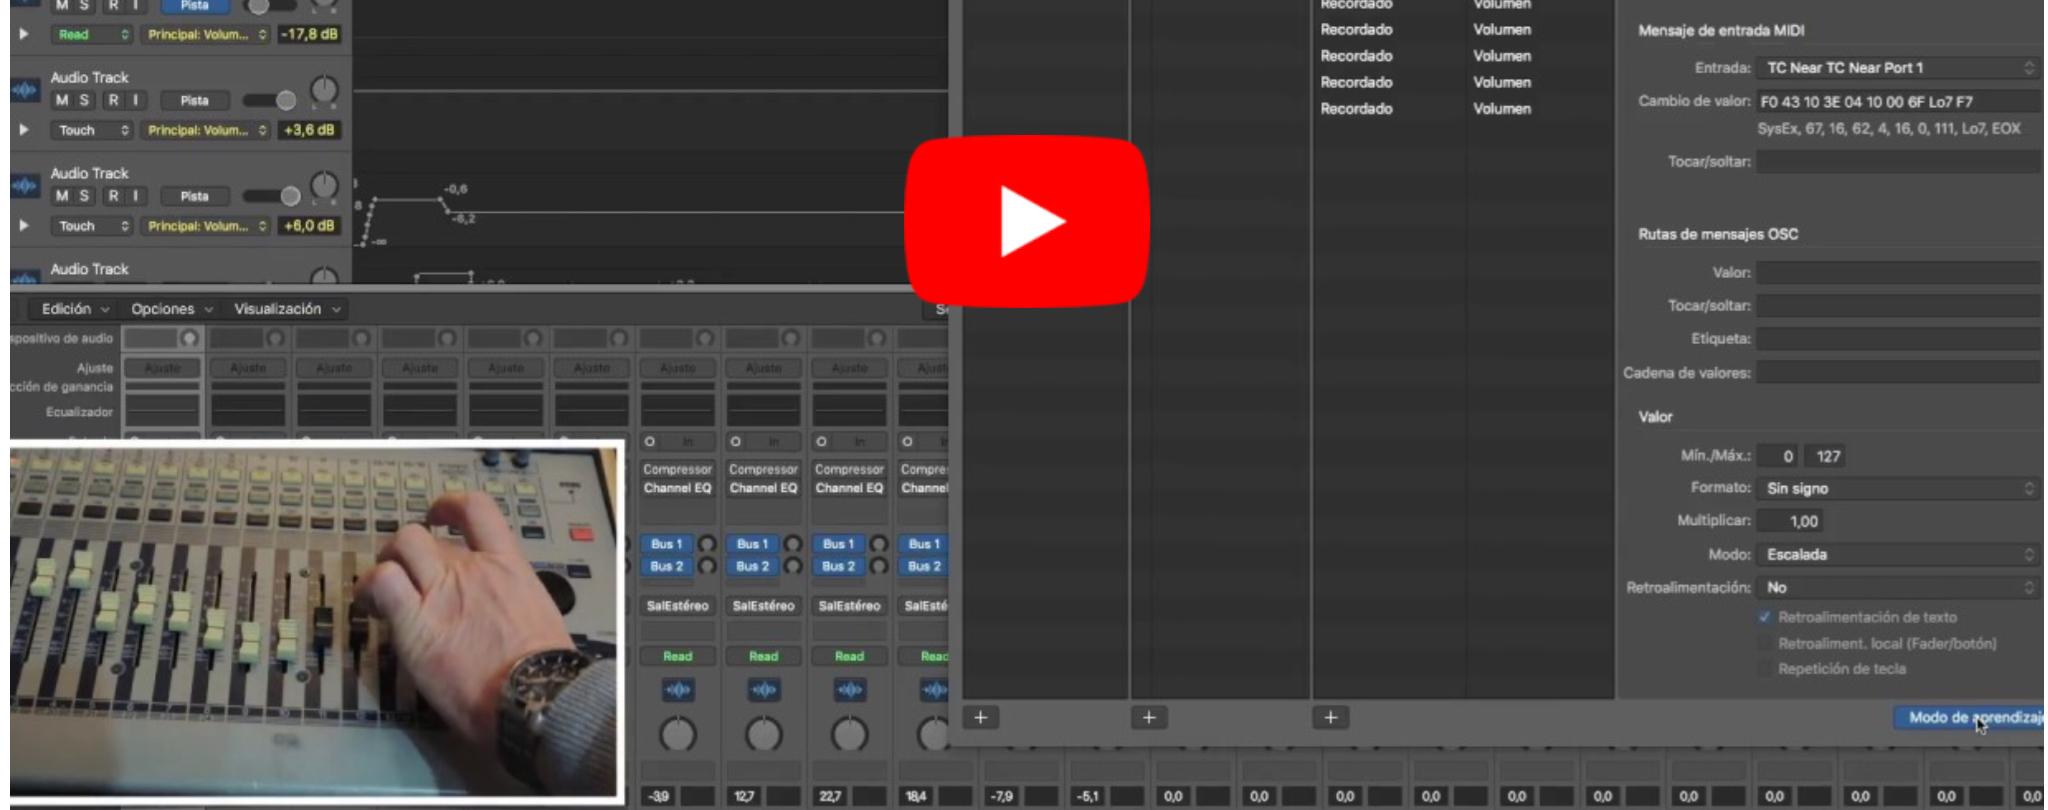 Controlar Logic Pro X desde Yamaha 01V primera versión.